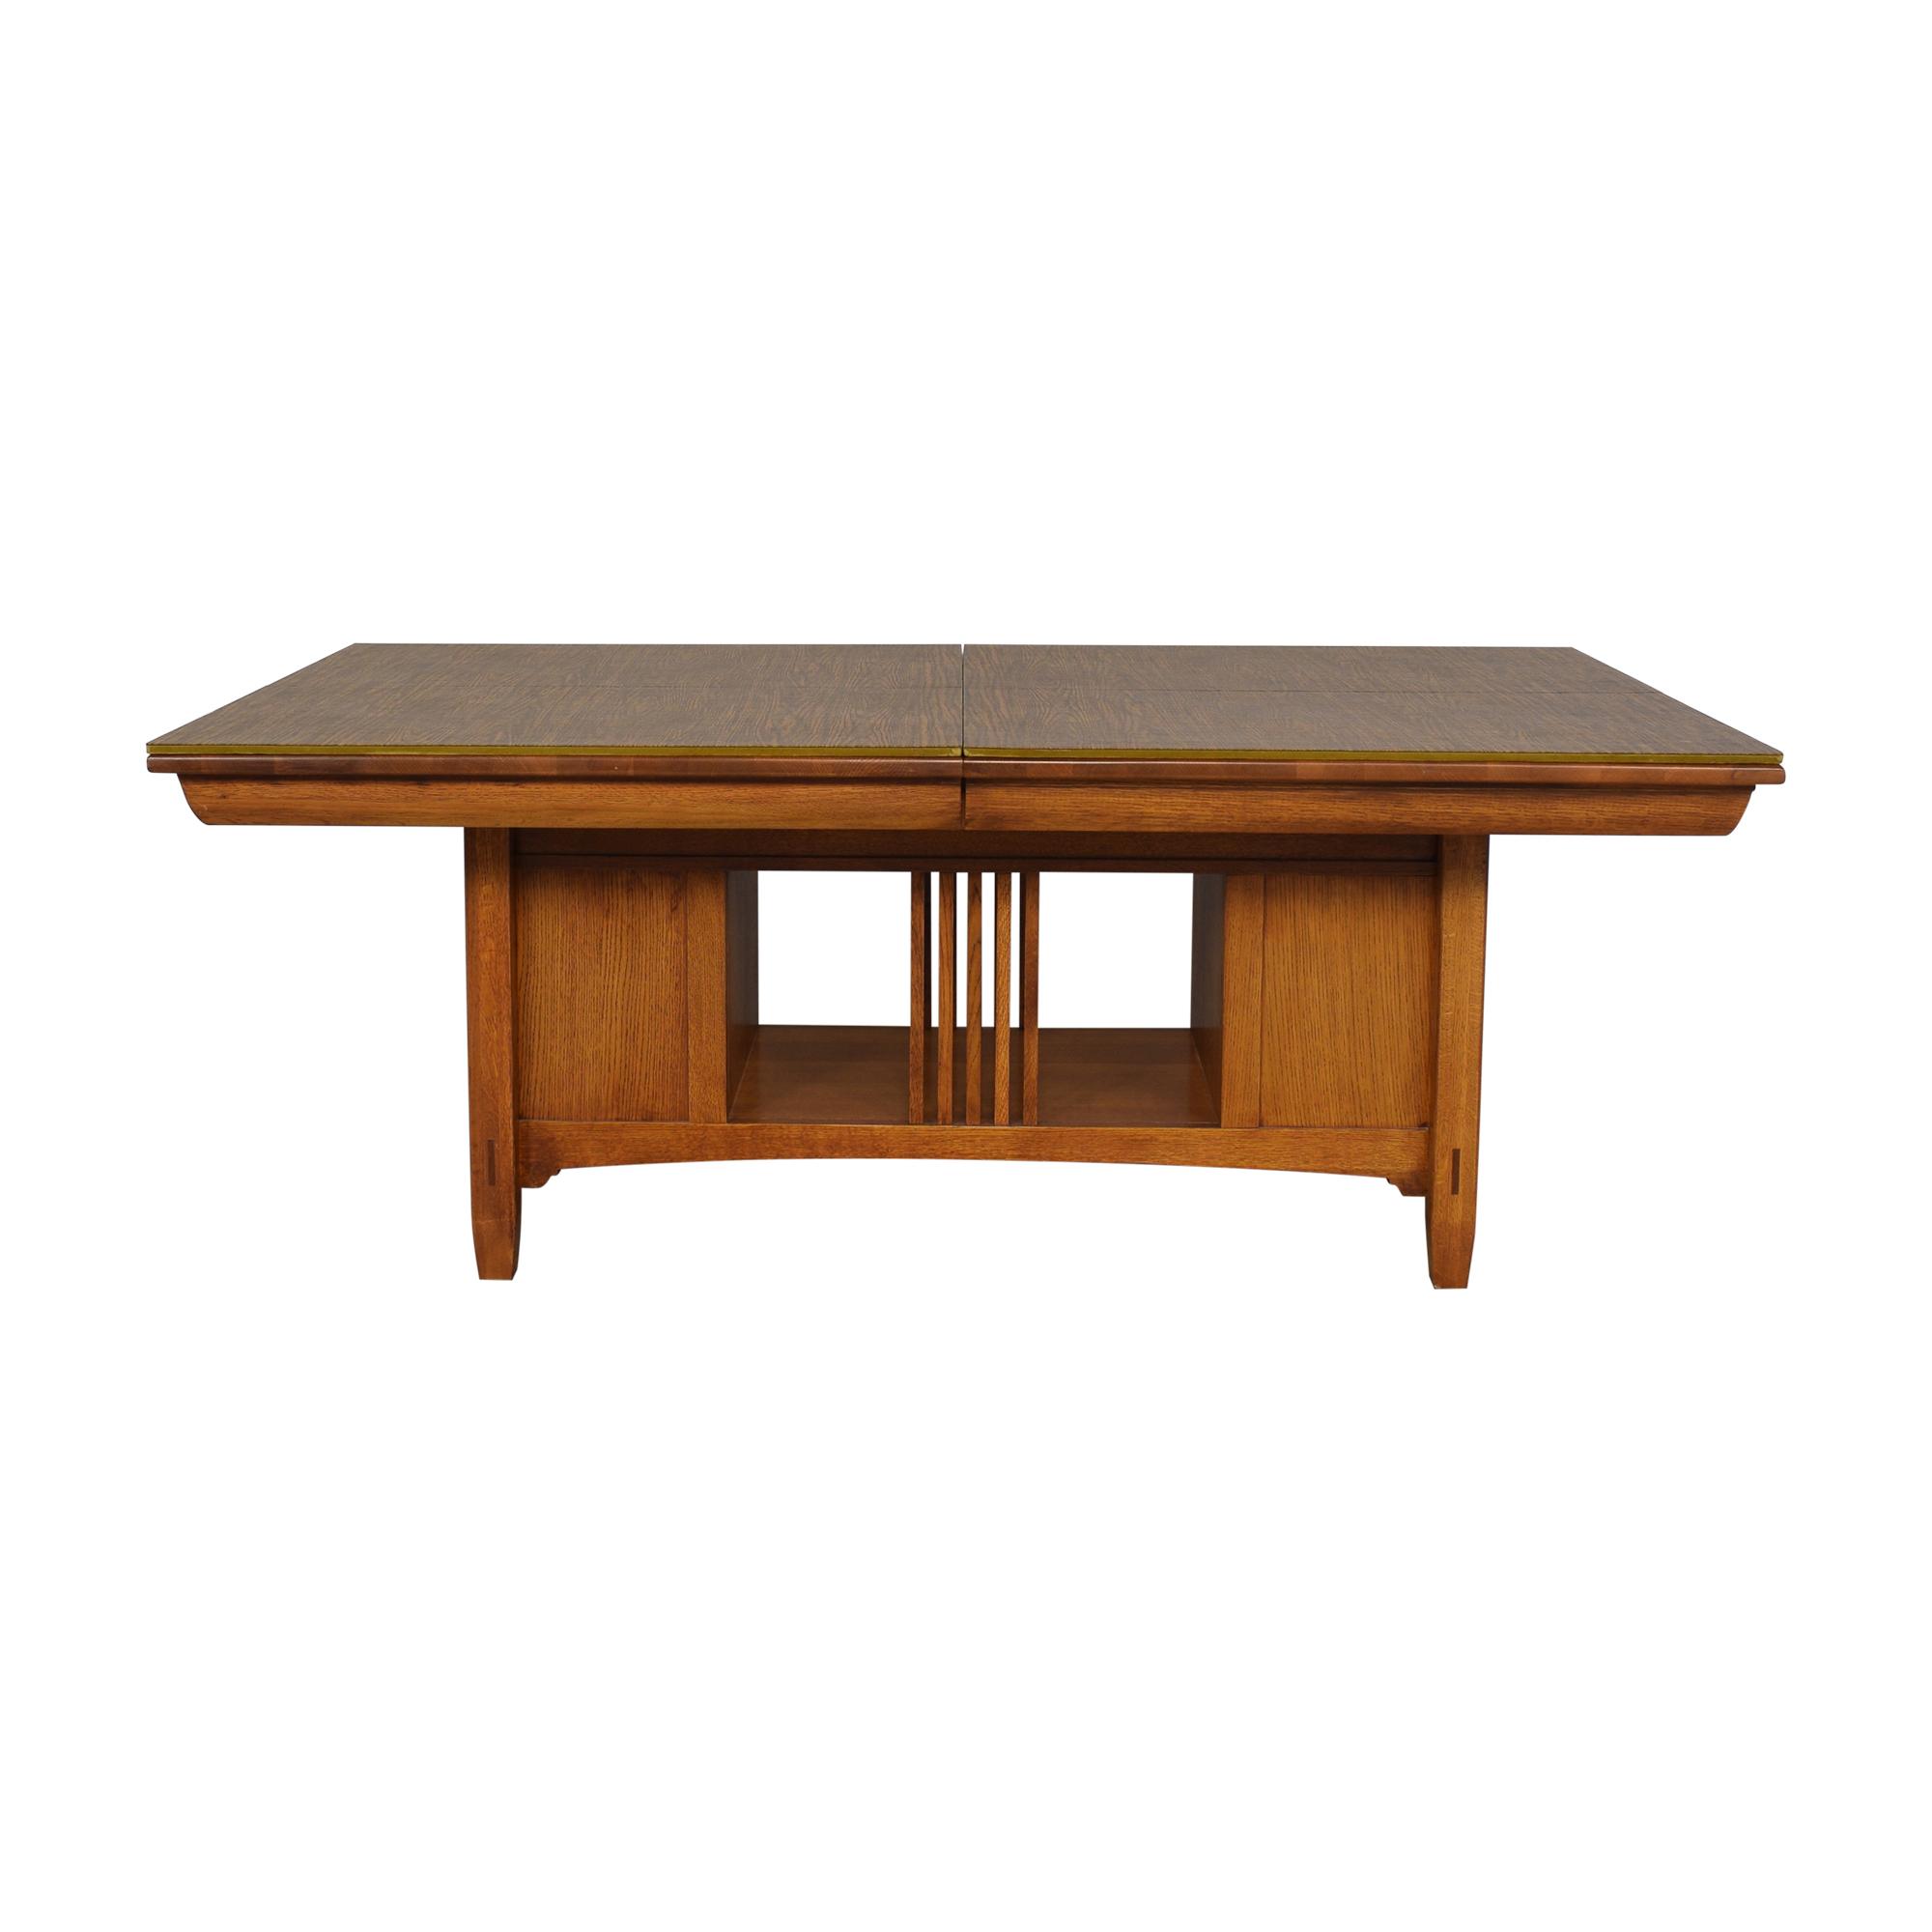 Lexington Furniture Lexington Bob Timberlake Arts & Crafts Collection Storage Dining Table price